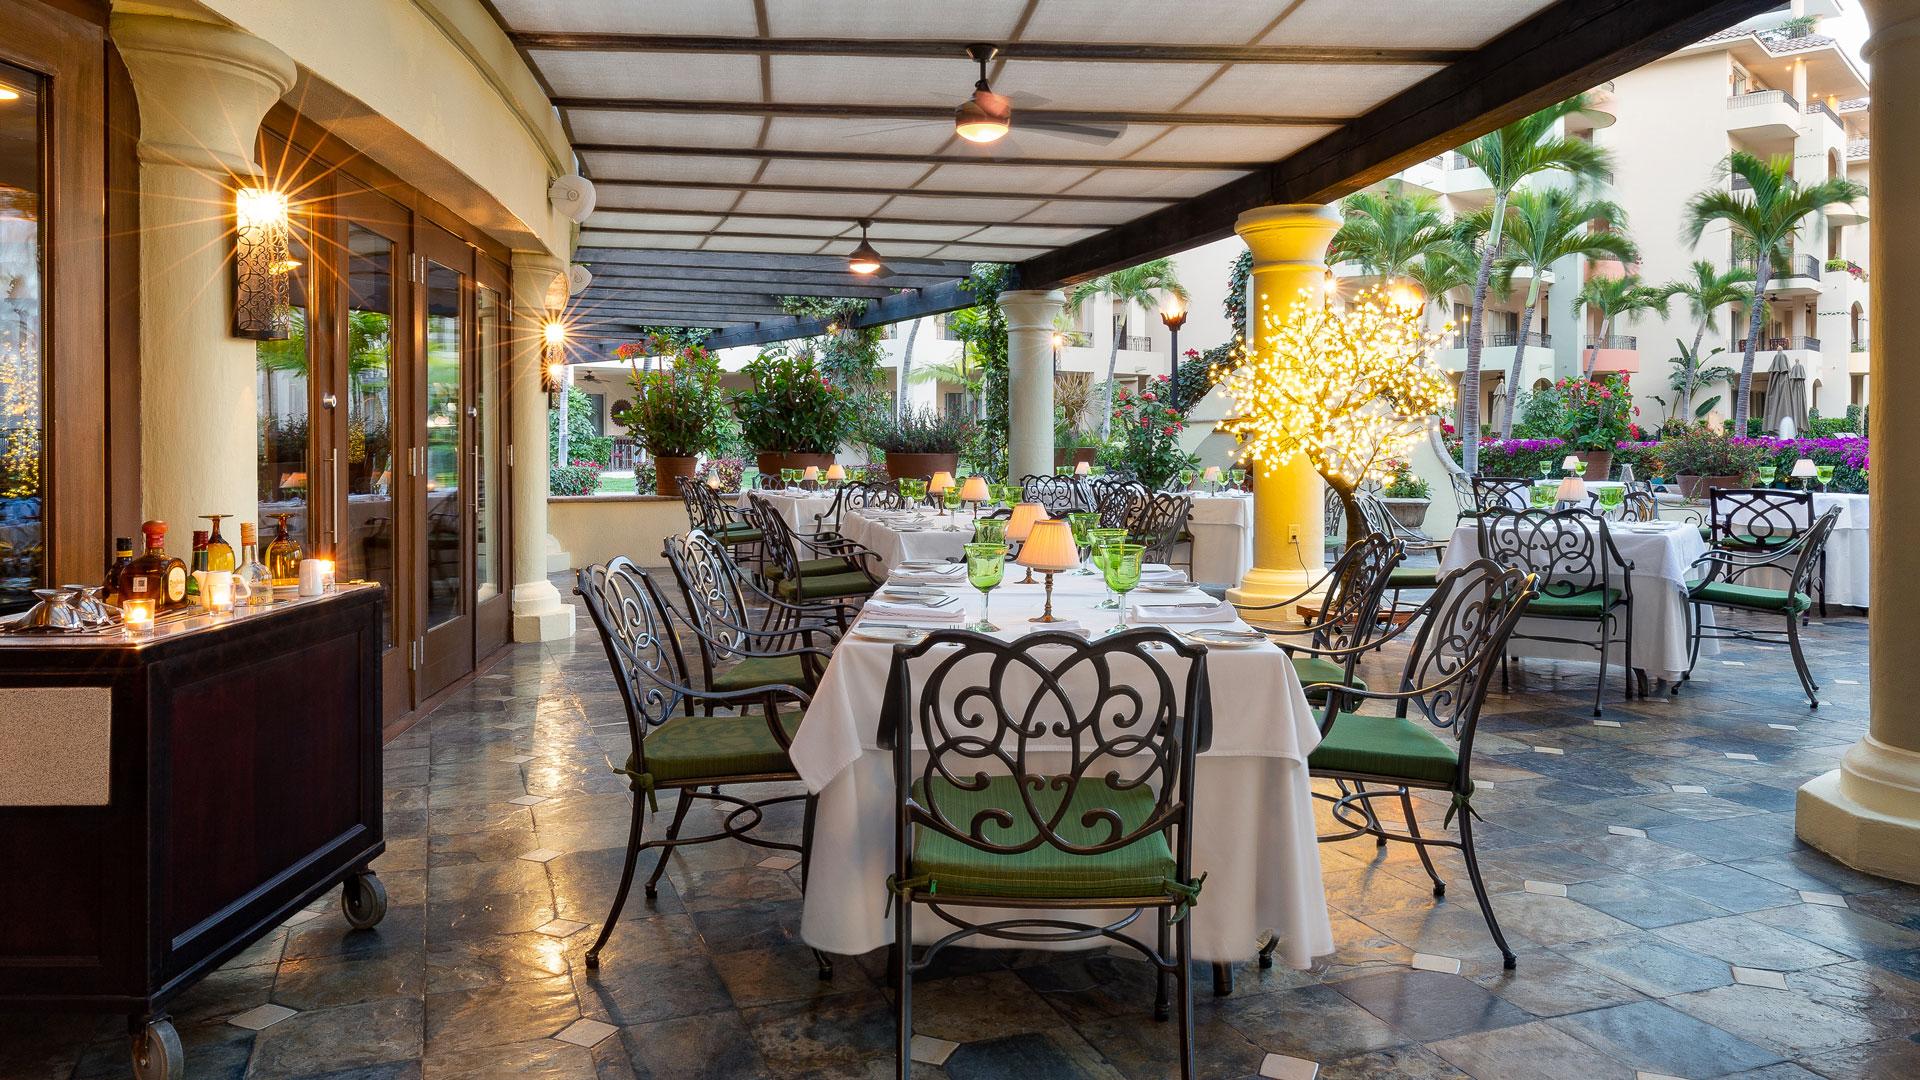 Villa la estancia cabo san lucas la casona restaurants